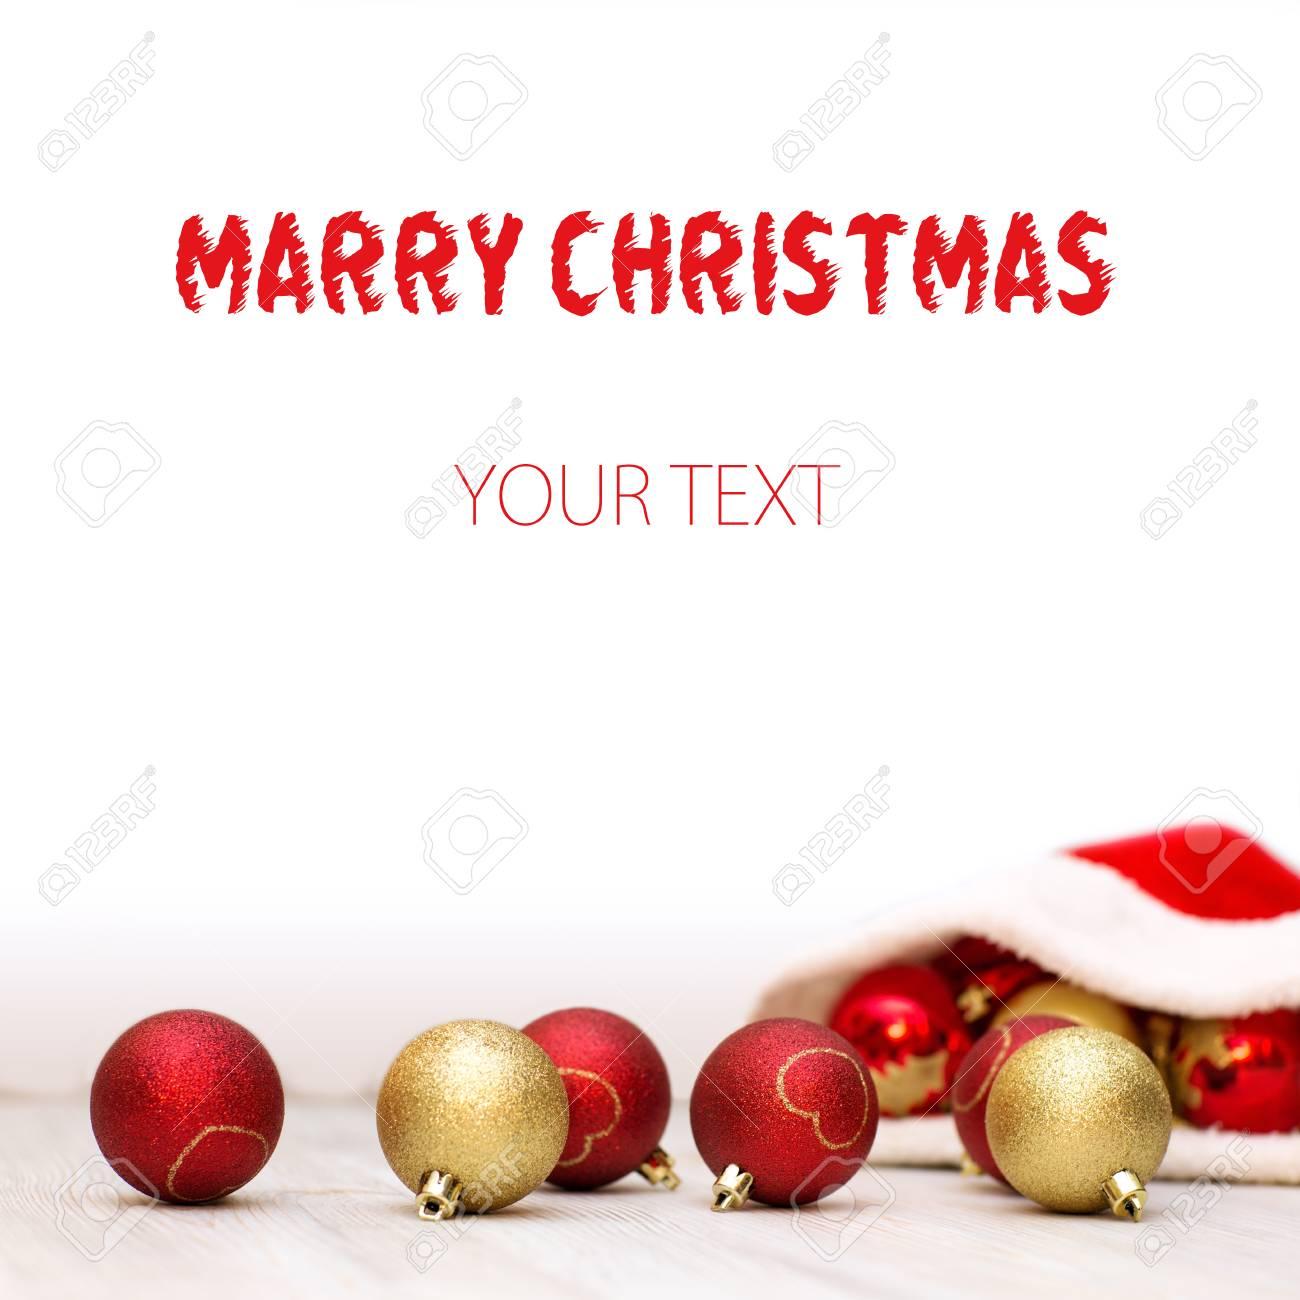 Beautiful Christmas Background Design.Beautiful Christmas Background With Santa Claus Hat And Red